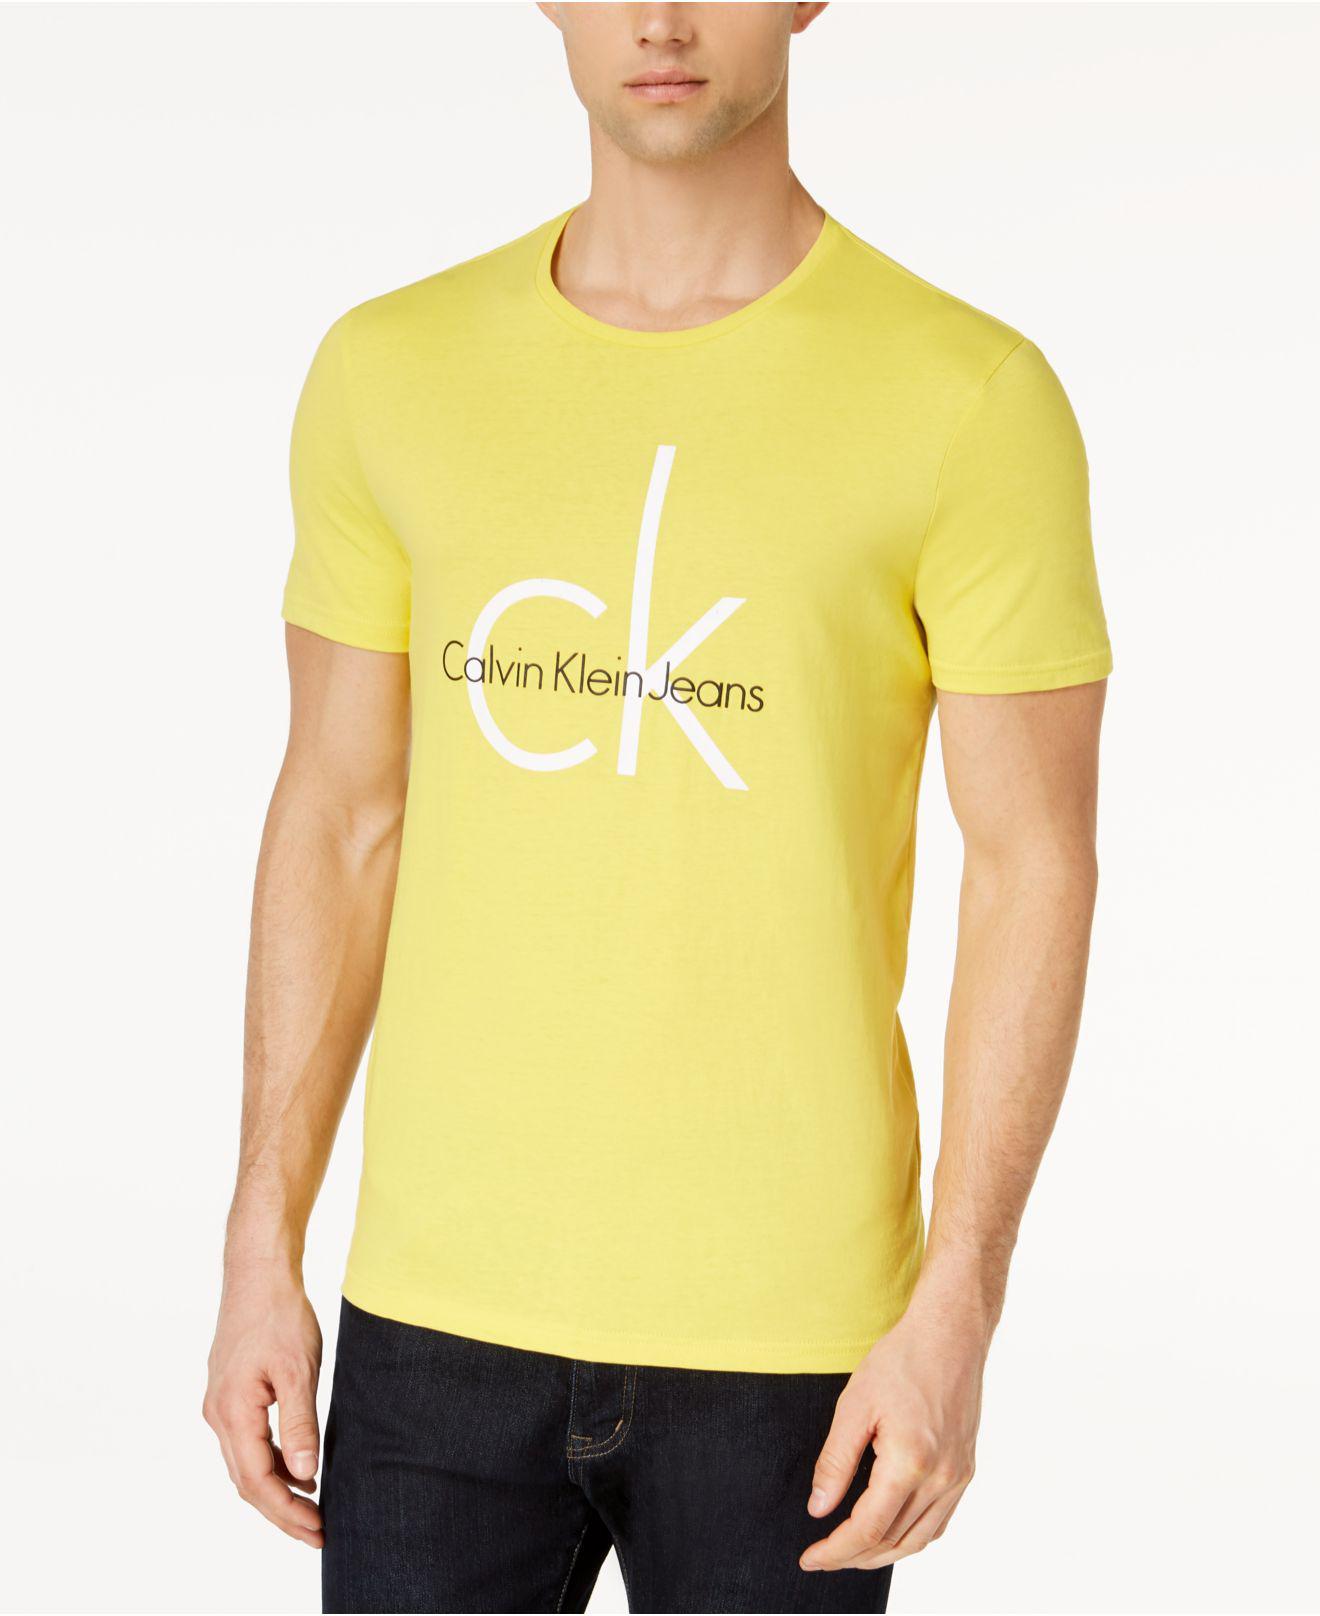 ed4166460a0d Calvin Klein Classic Ck Logo-print T-shirt in Yellow for Men - Lyst